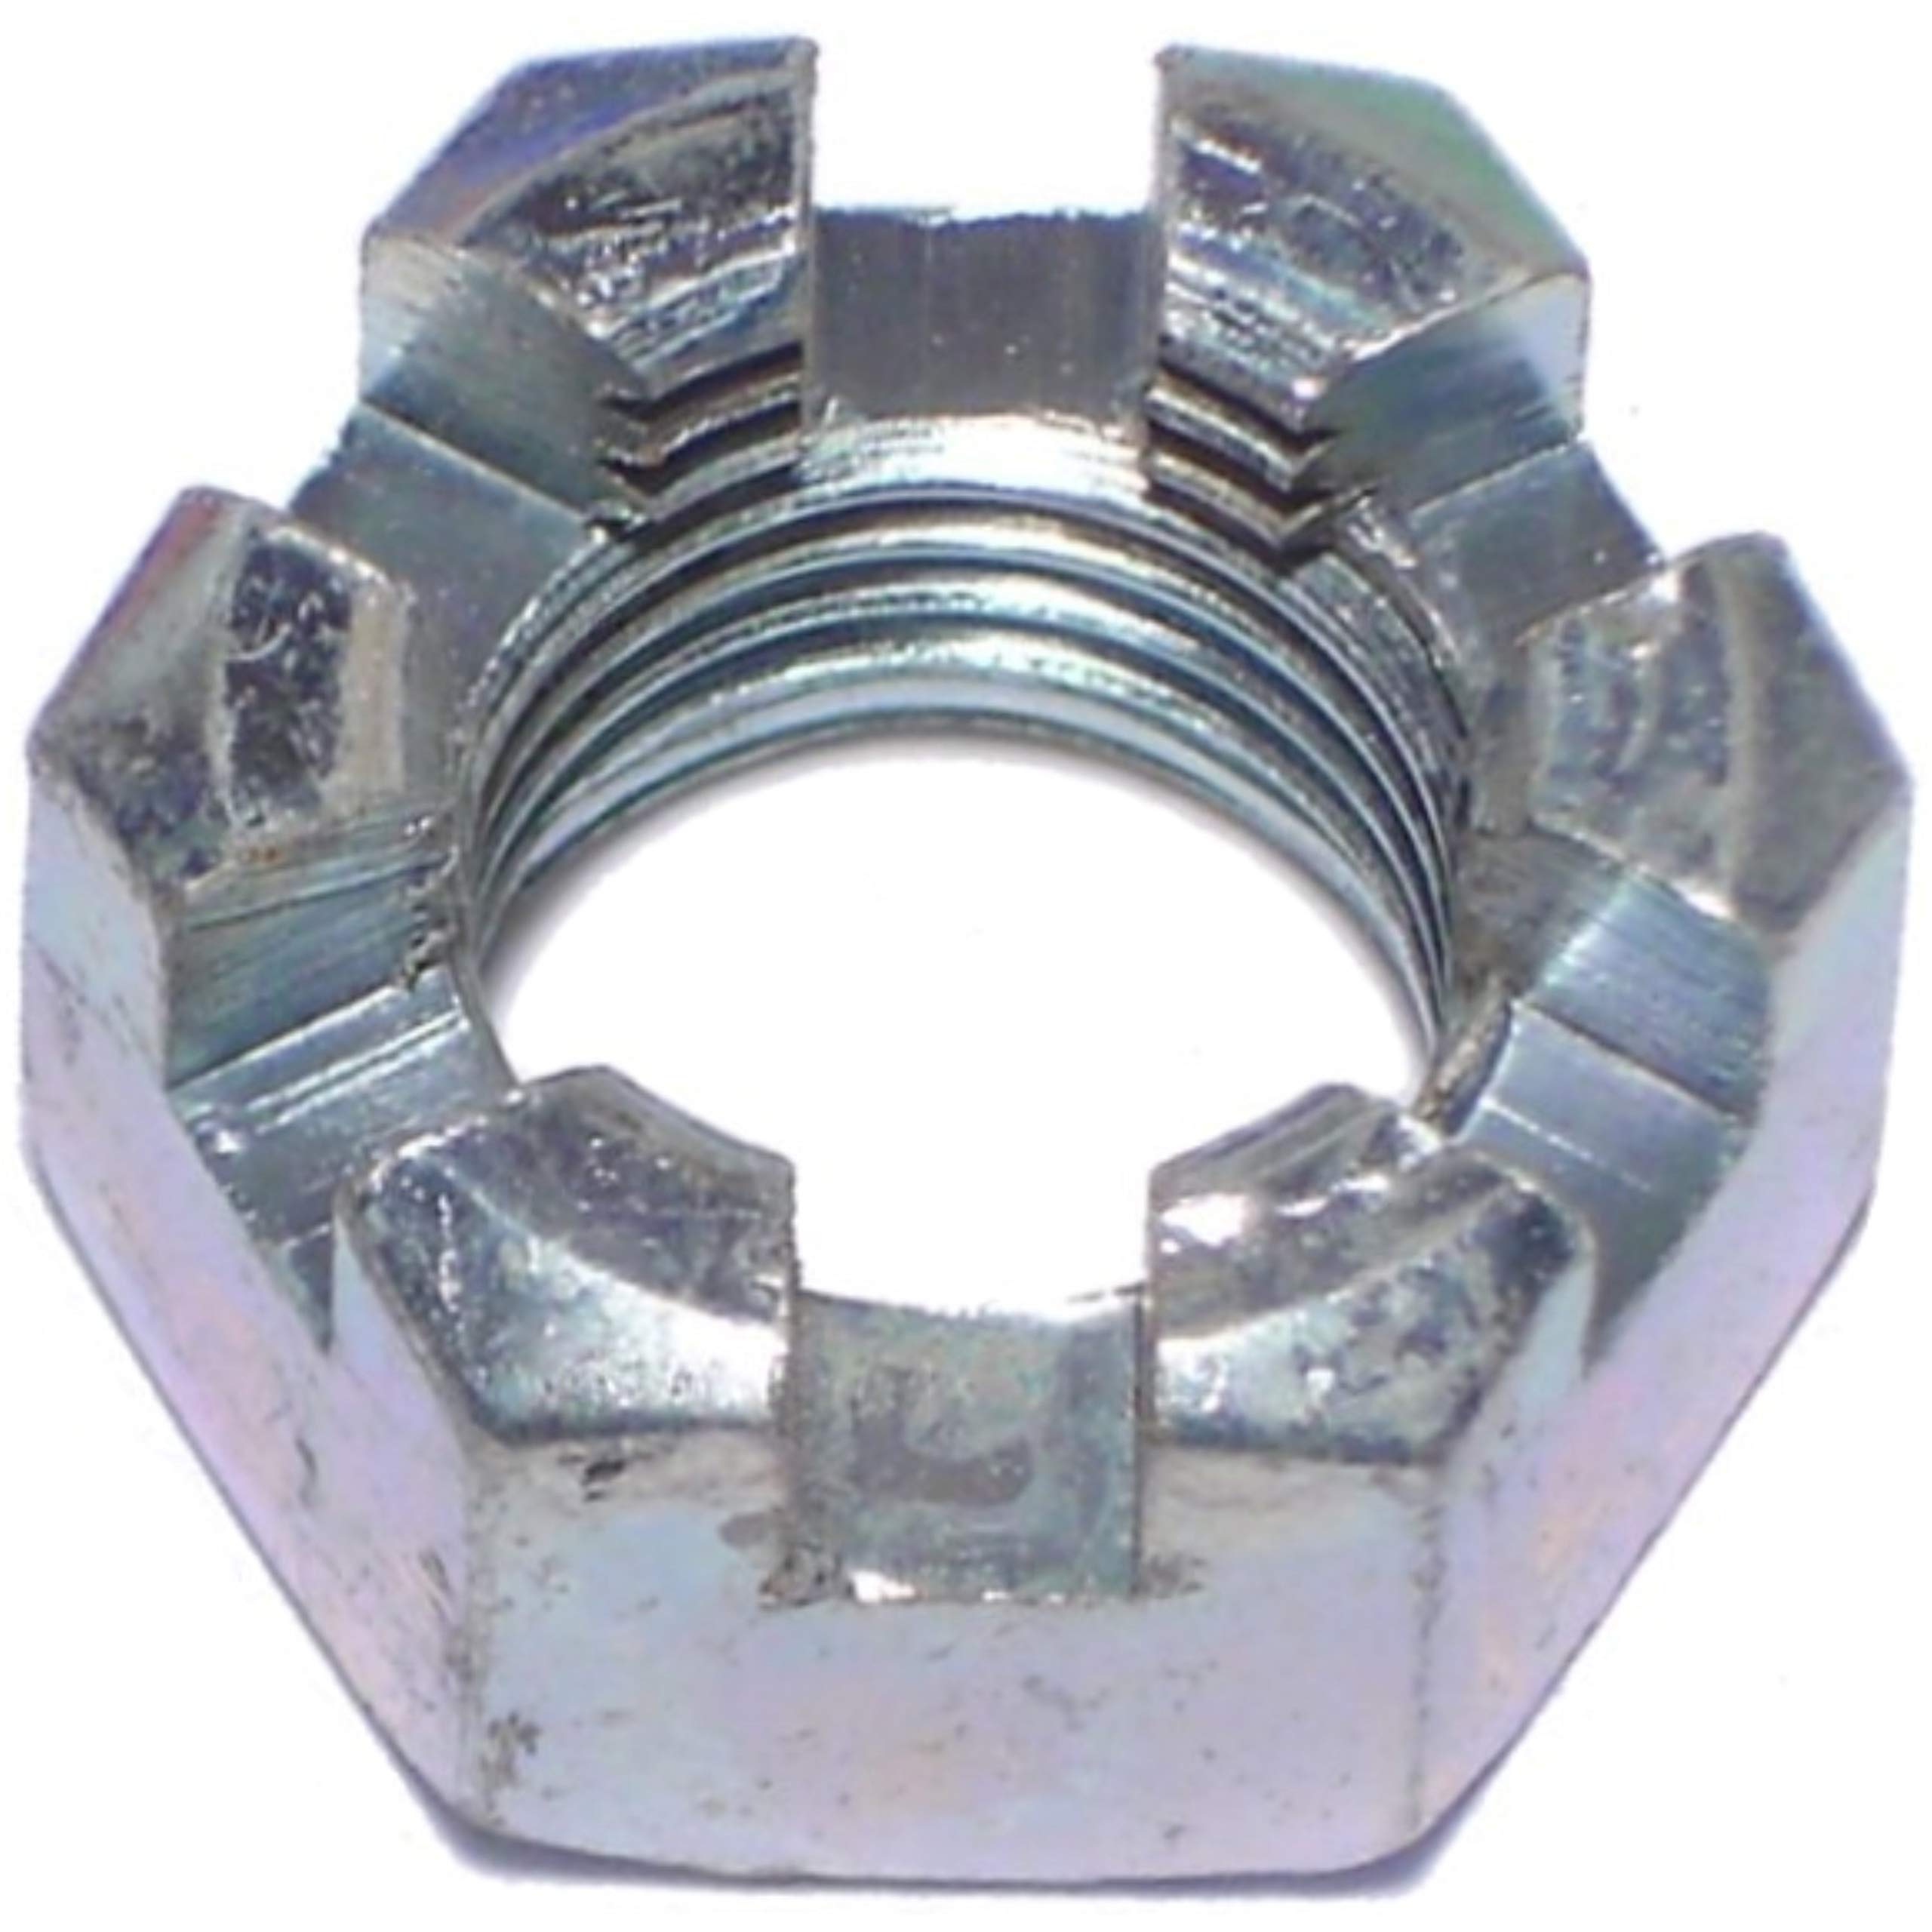 Hard-to-Find Fastener 014973261139 Fine Castle Nuts, 1/2-20, Piece-8